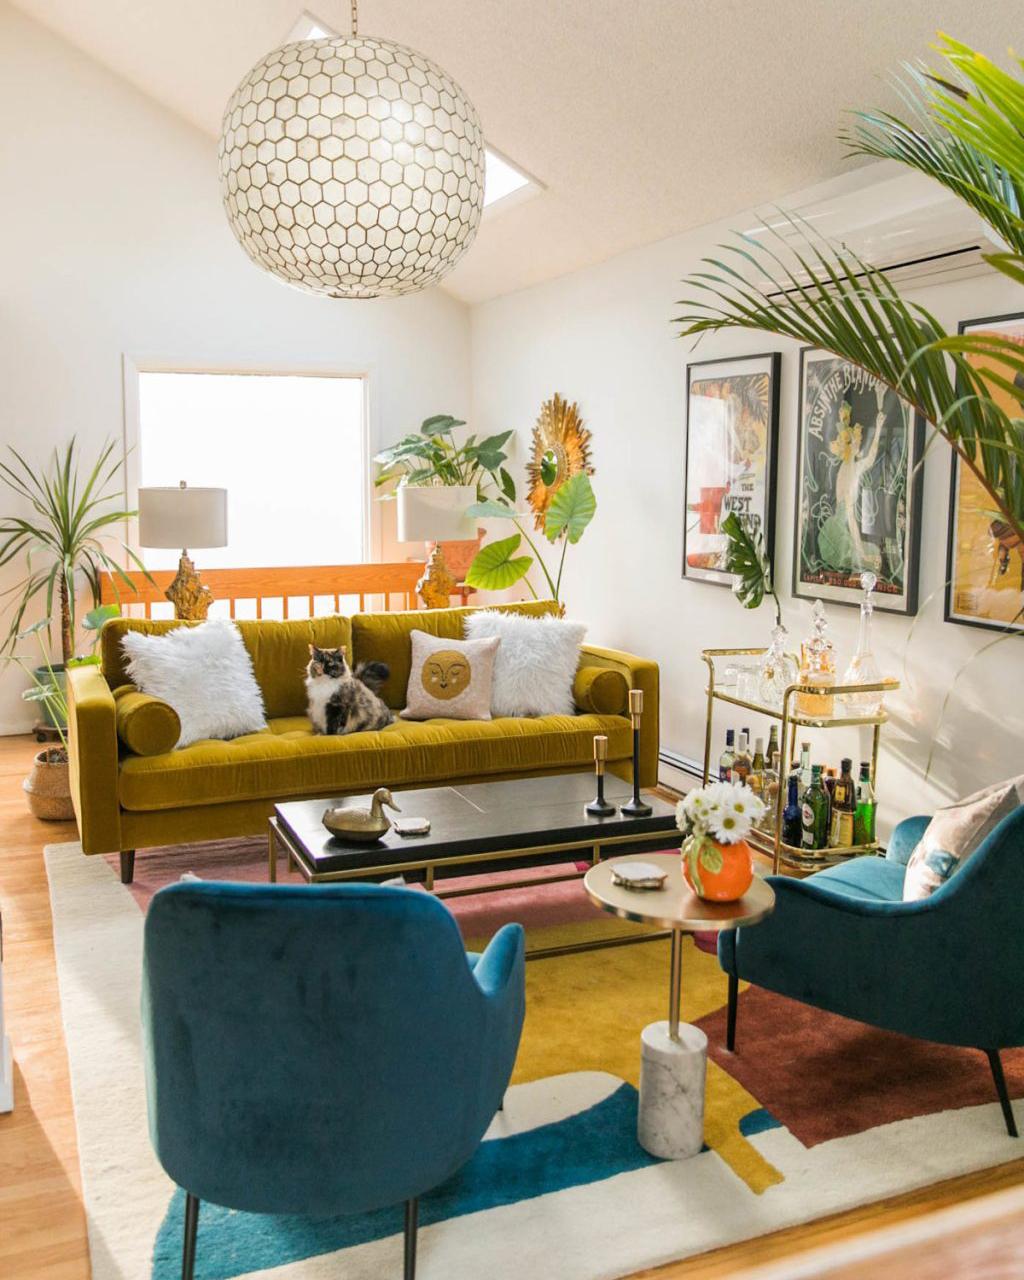 Jessica Brigham's Vibrant & Glamorous Mid Century Living Room